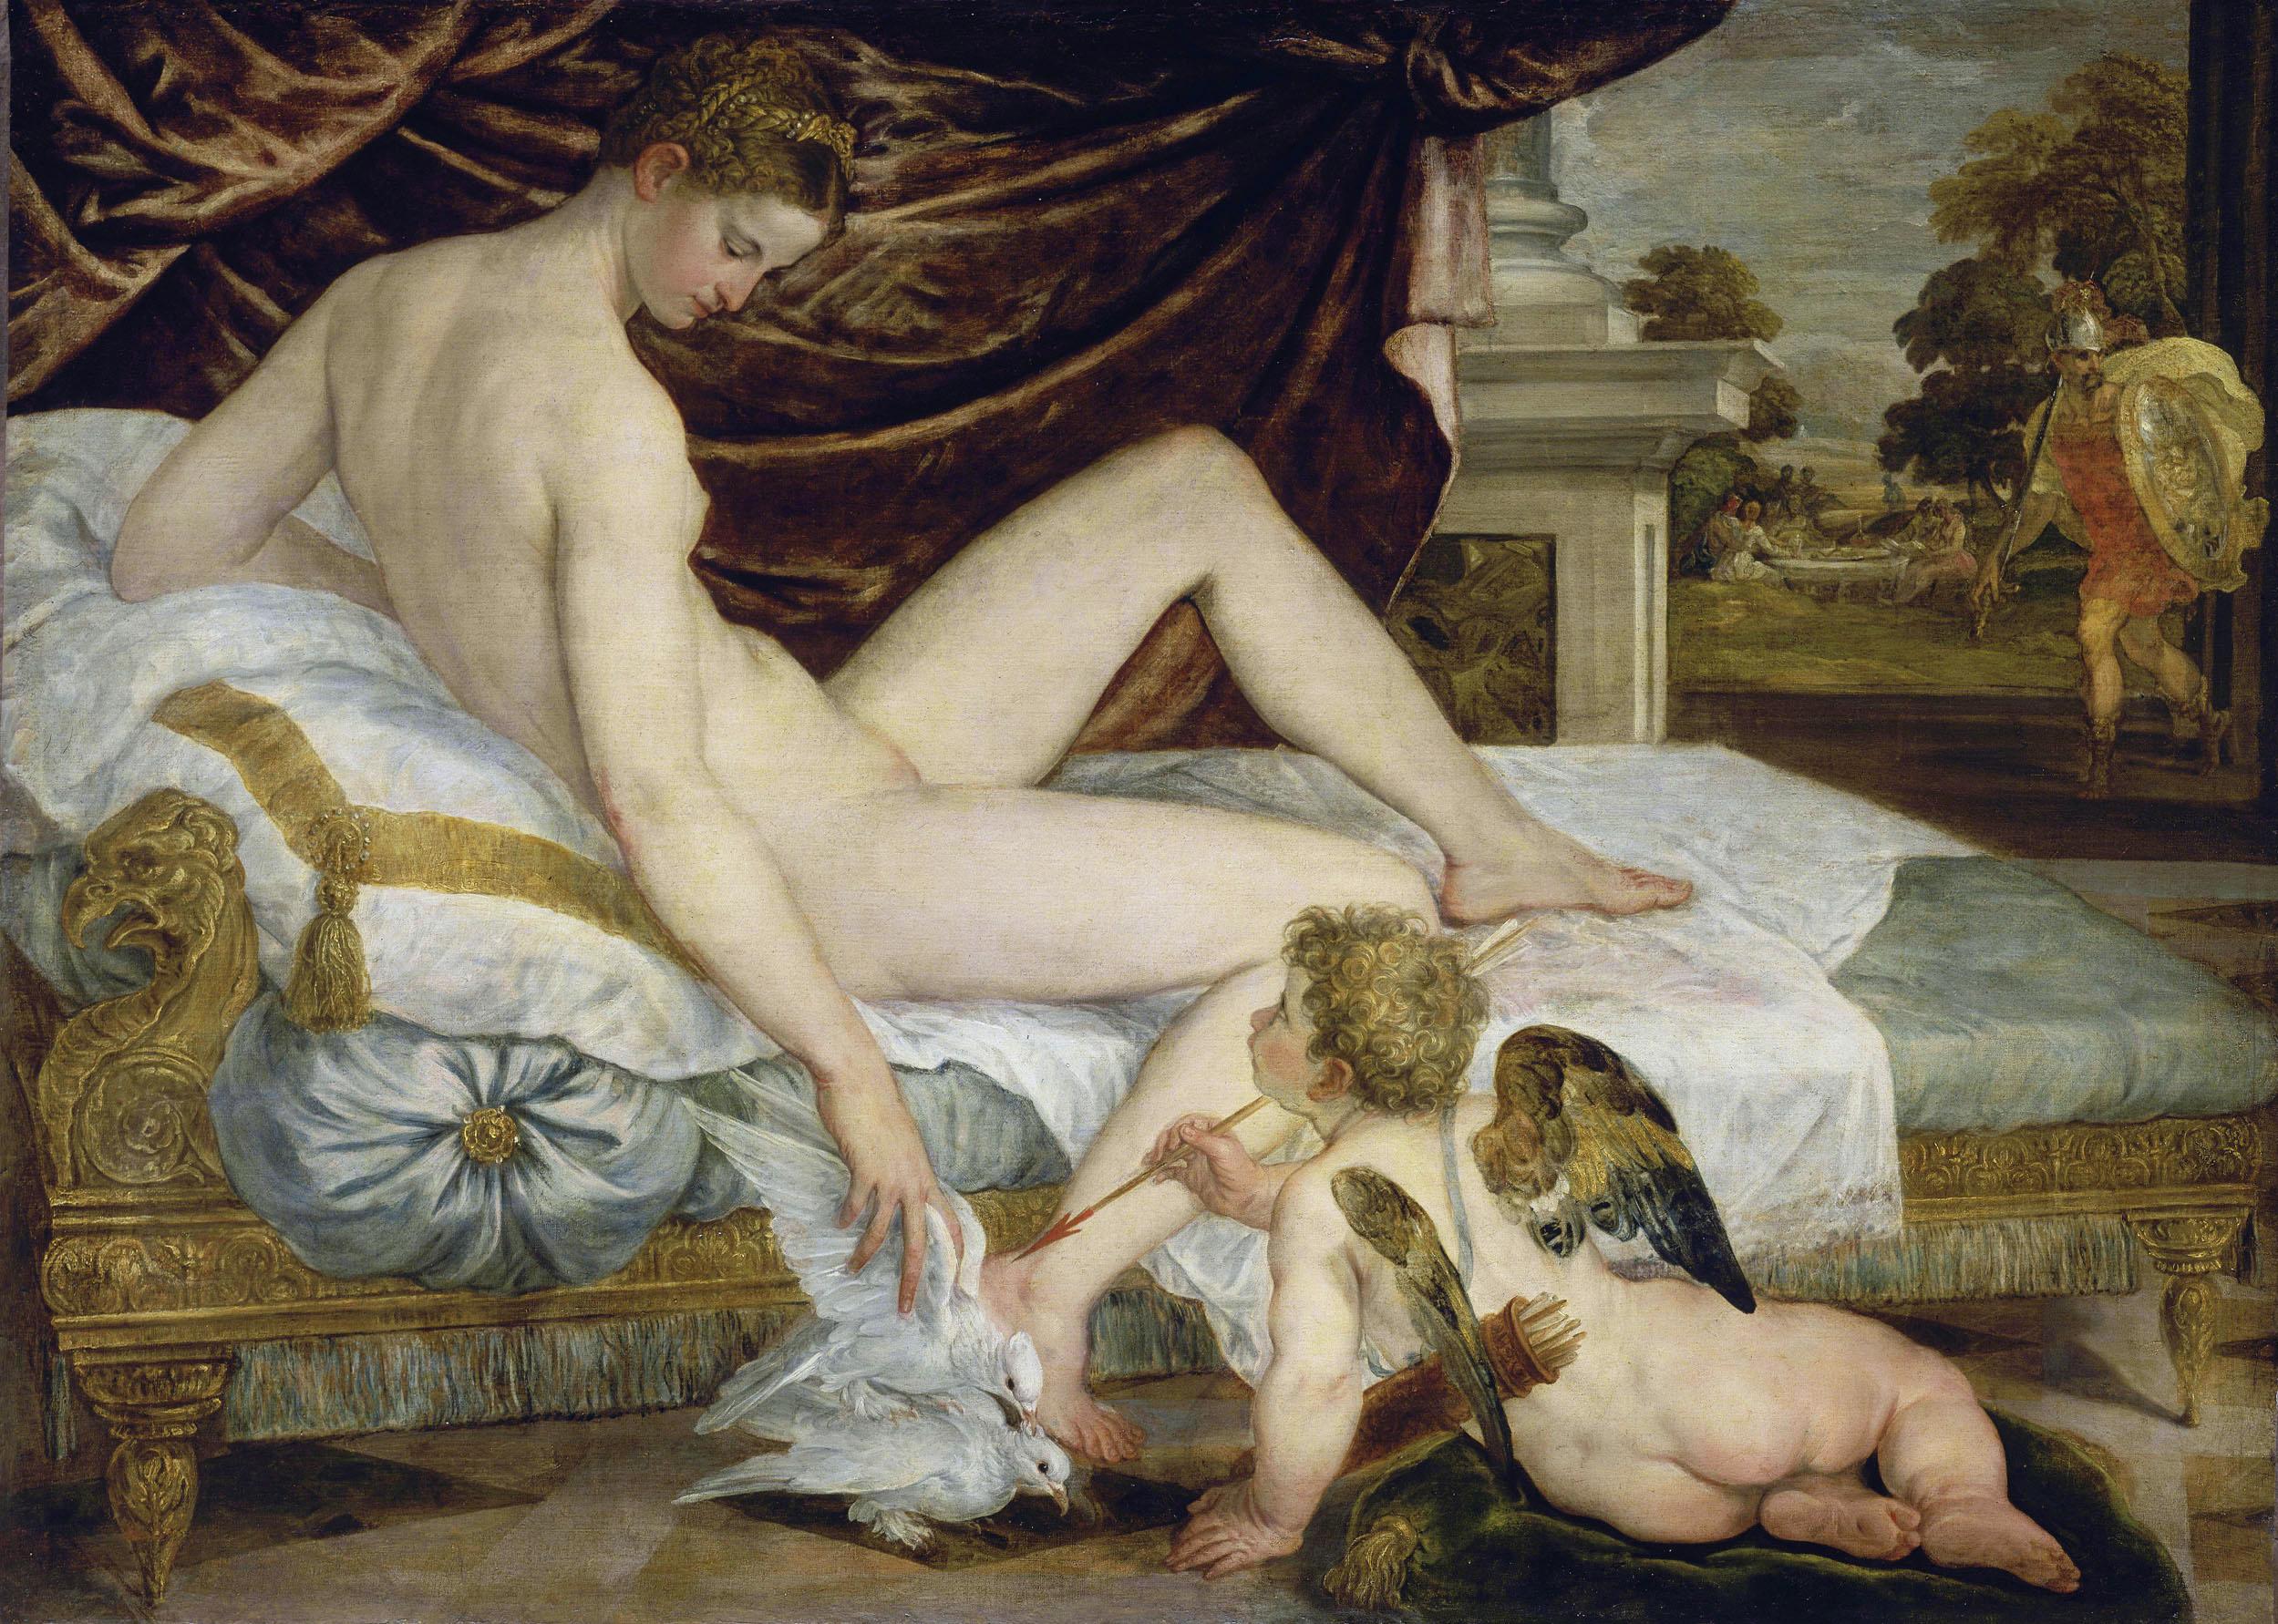 Lambert Sustris, ок.1520 - ок.1568. Венера и Купидон. ок.1560. 132 x 184 см. Париж, Лувр